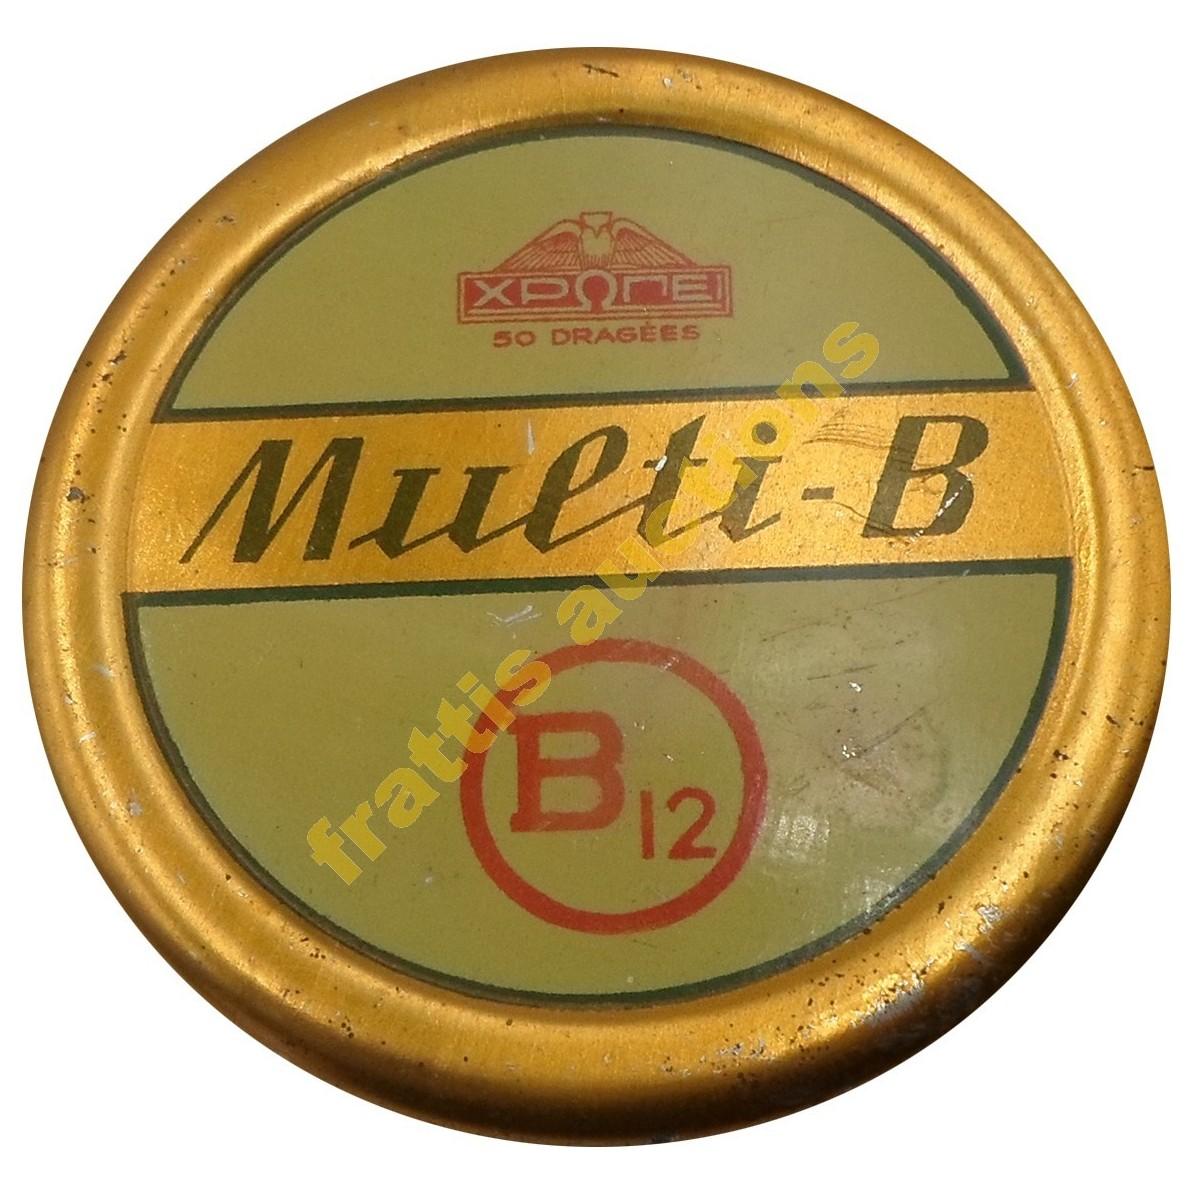 Multi B, Χρωματουργεία Πειραιώς, μεταλλικό κουτί.ΧΡΩΠΕΙ